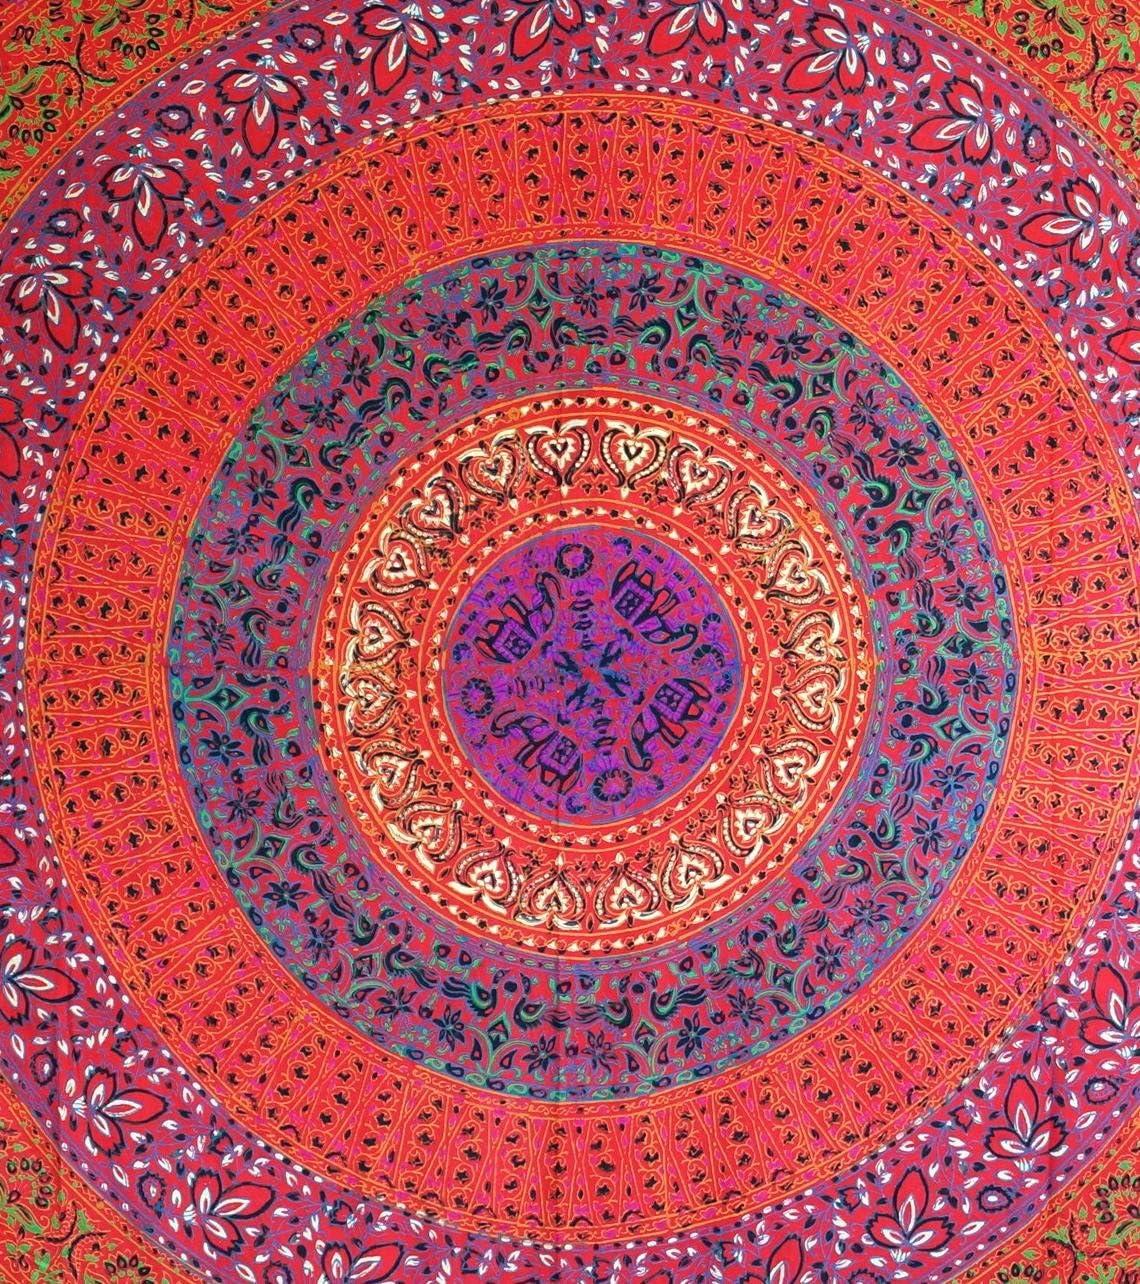 Batik Guru-Shop Indisches Mandala Tuch Mehrfarbig 240x210 cm Baumwolle Sofa /Überwurf Bett/überwurf Batik Wandtuch Tagesdecke Mandala Druck